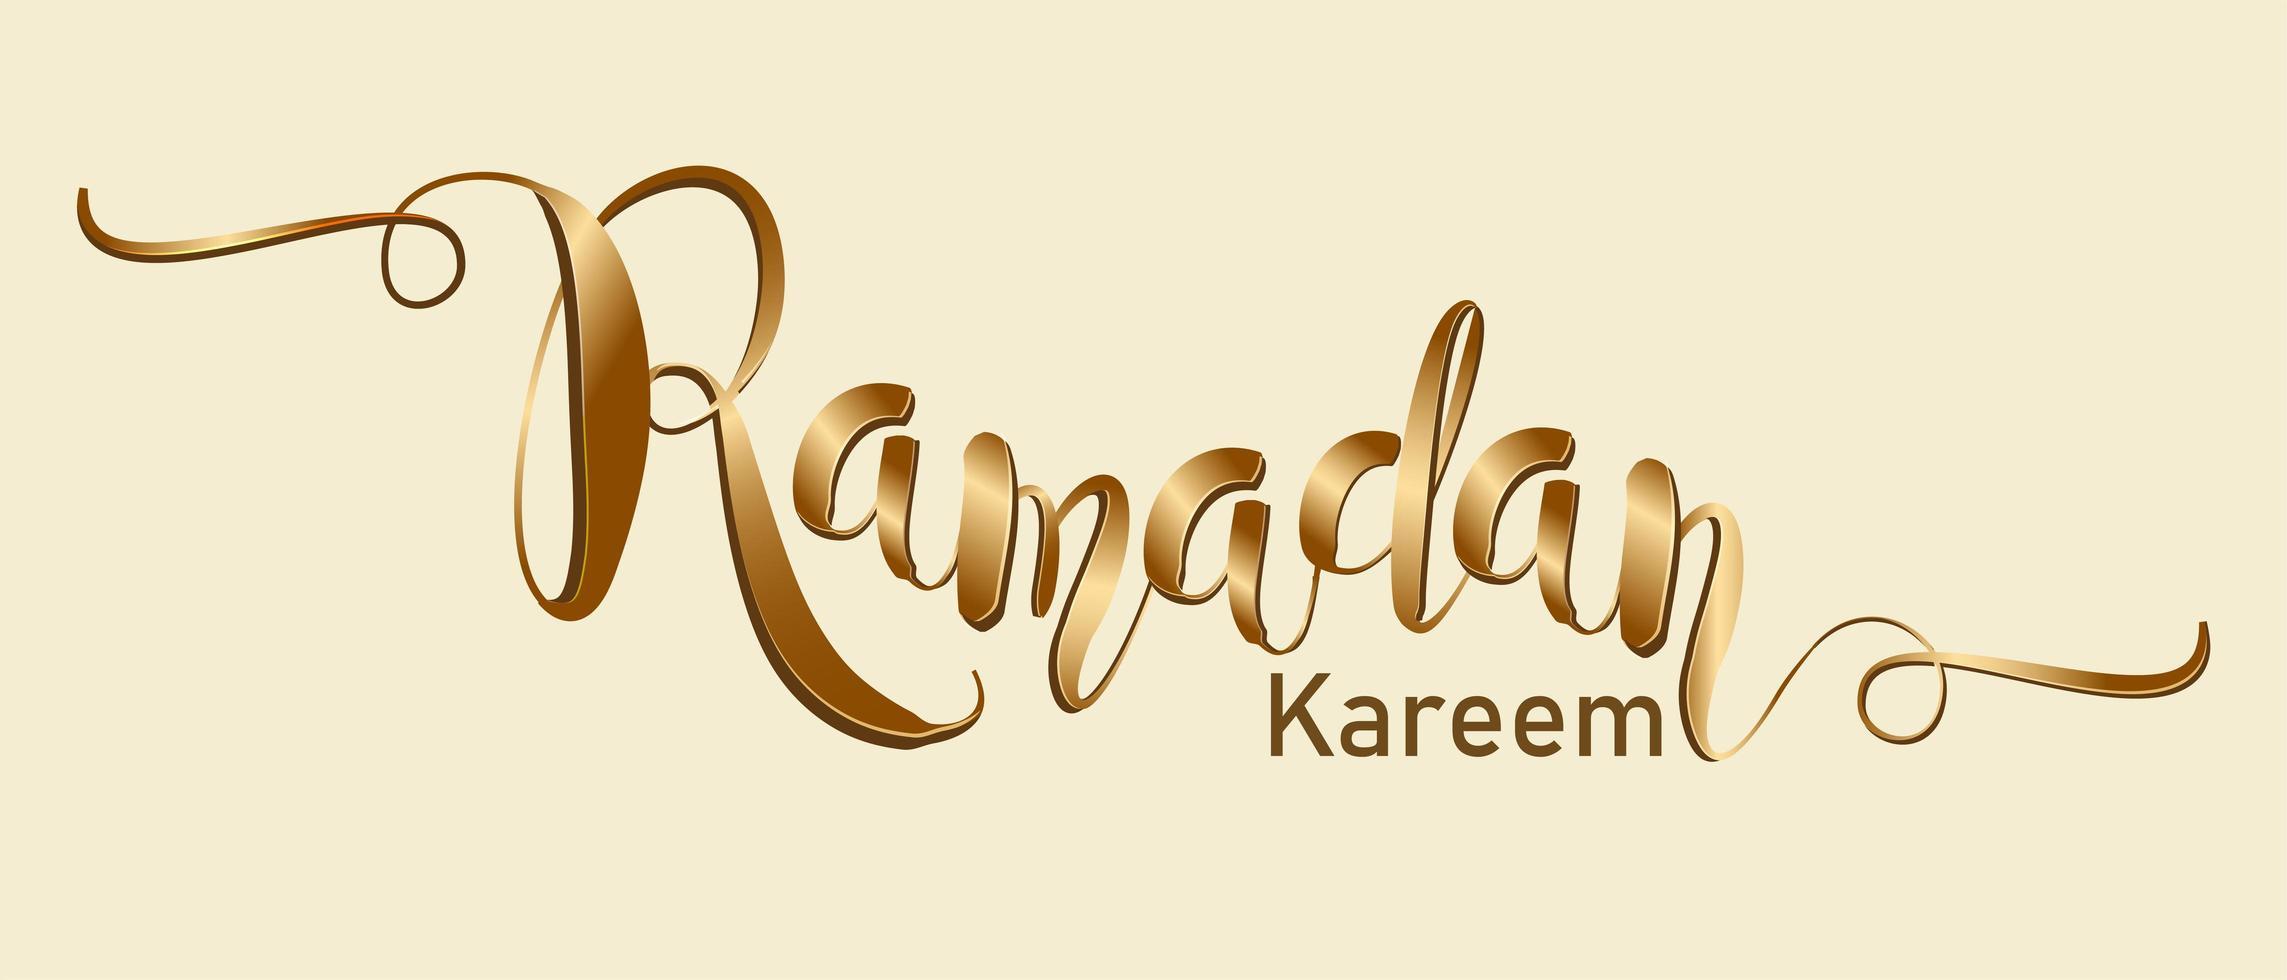 guld ramadan kareem typografi vektor